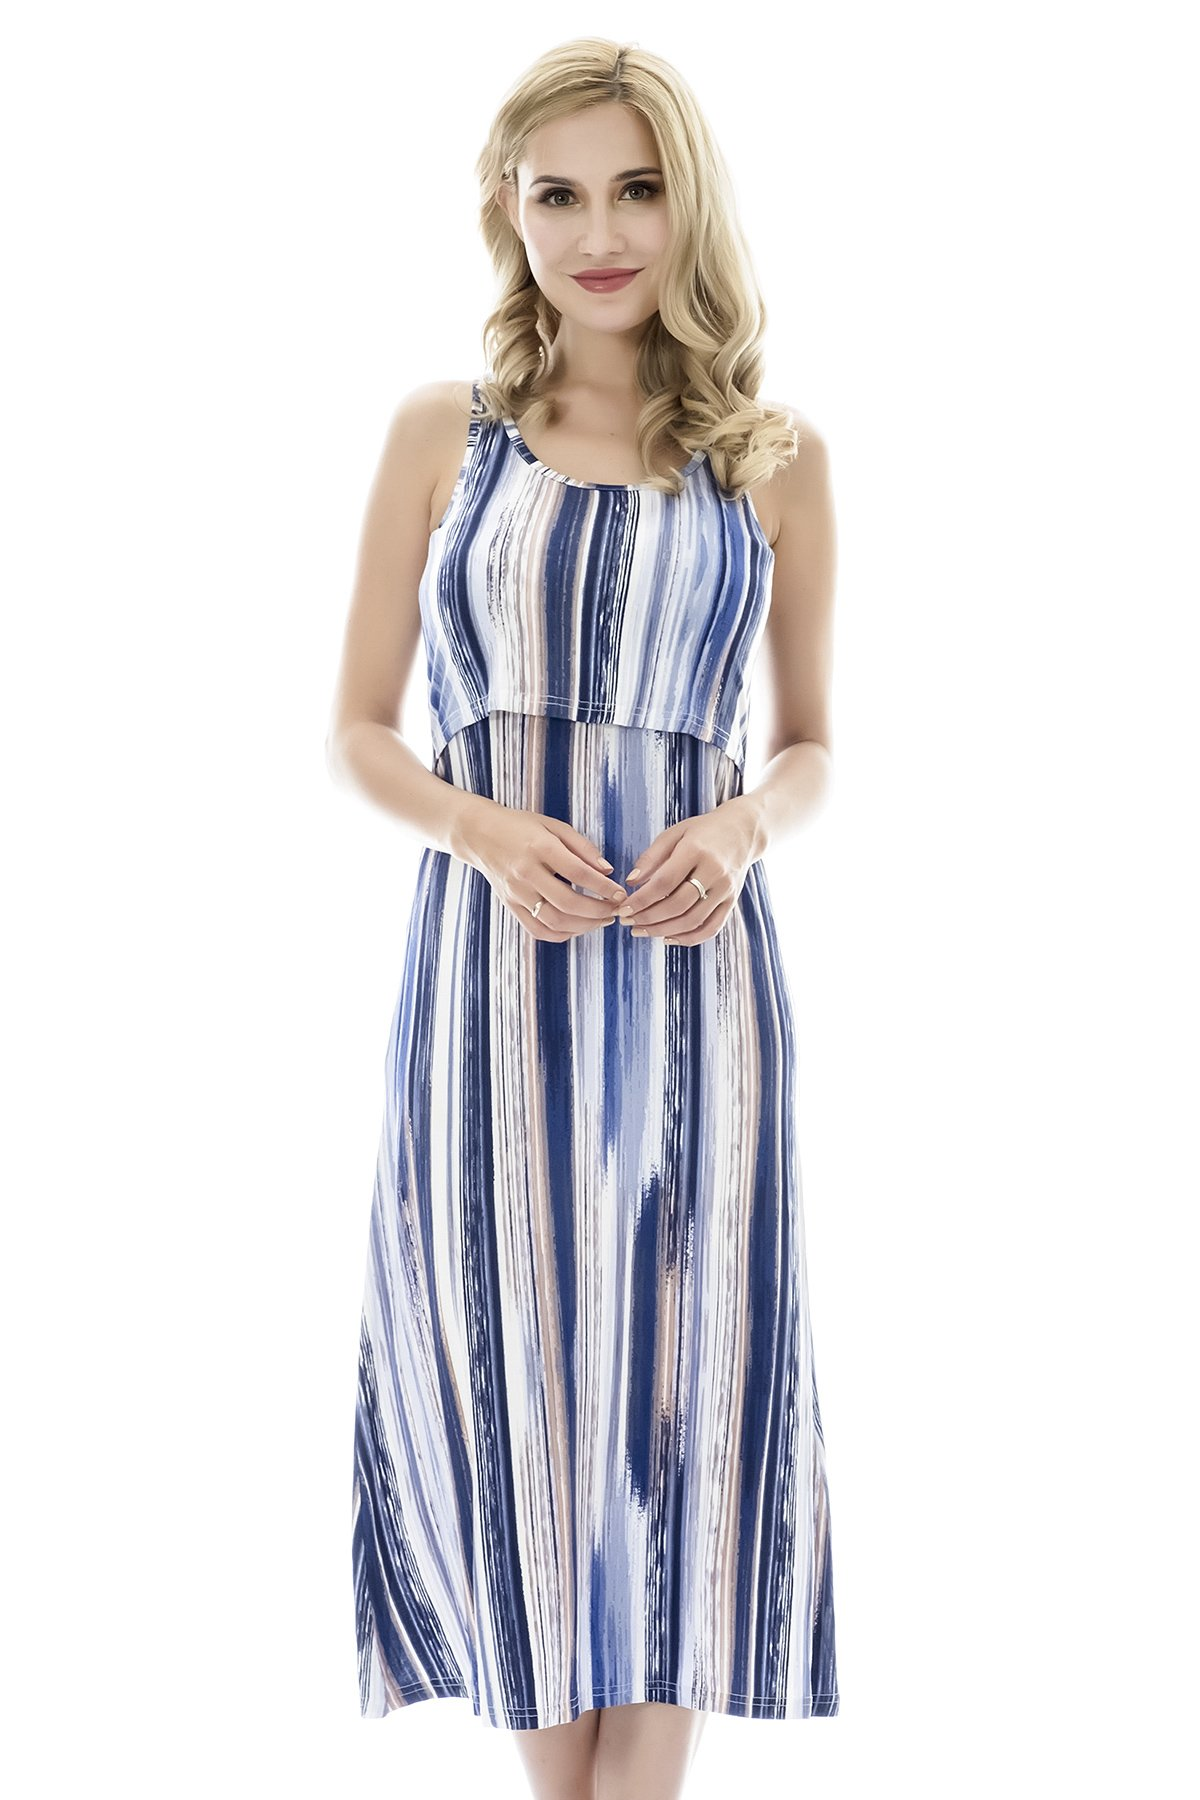 Bearsland Women's Long Style Nursing Breastfeeding Dresses,bluepurple,Medium